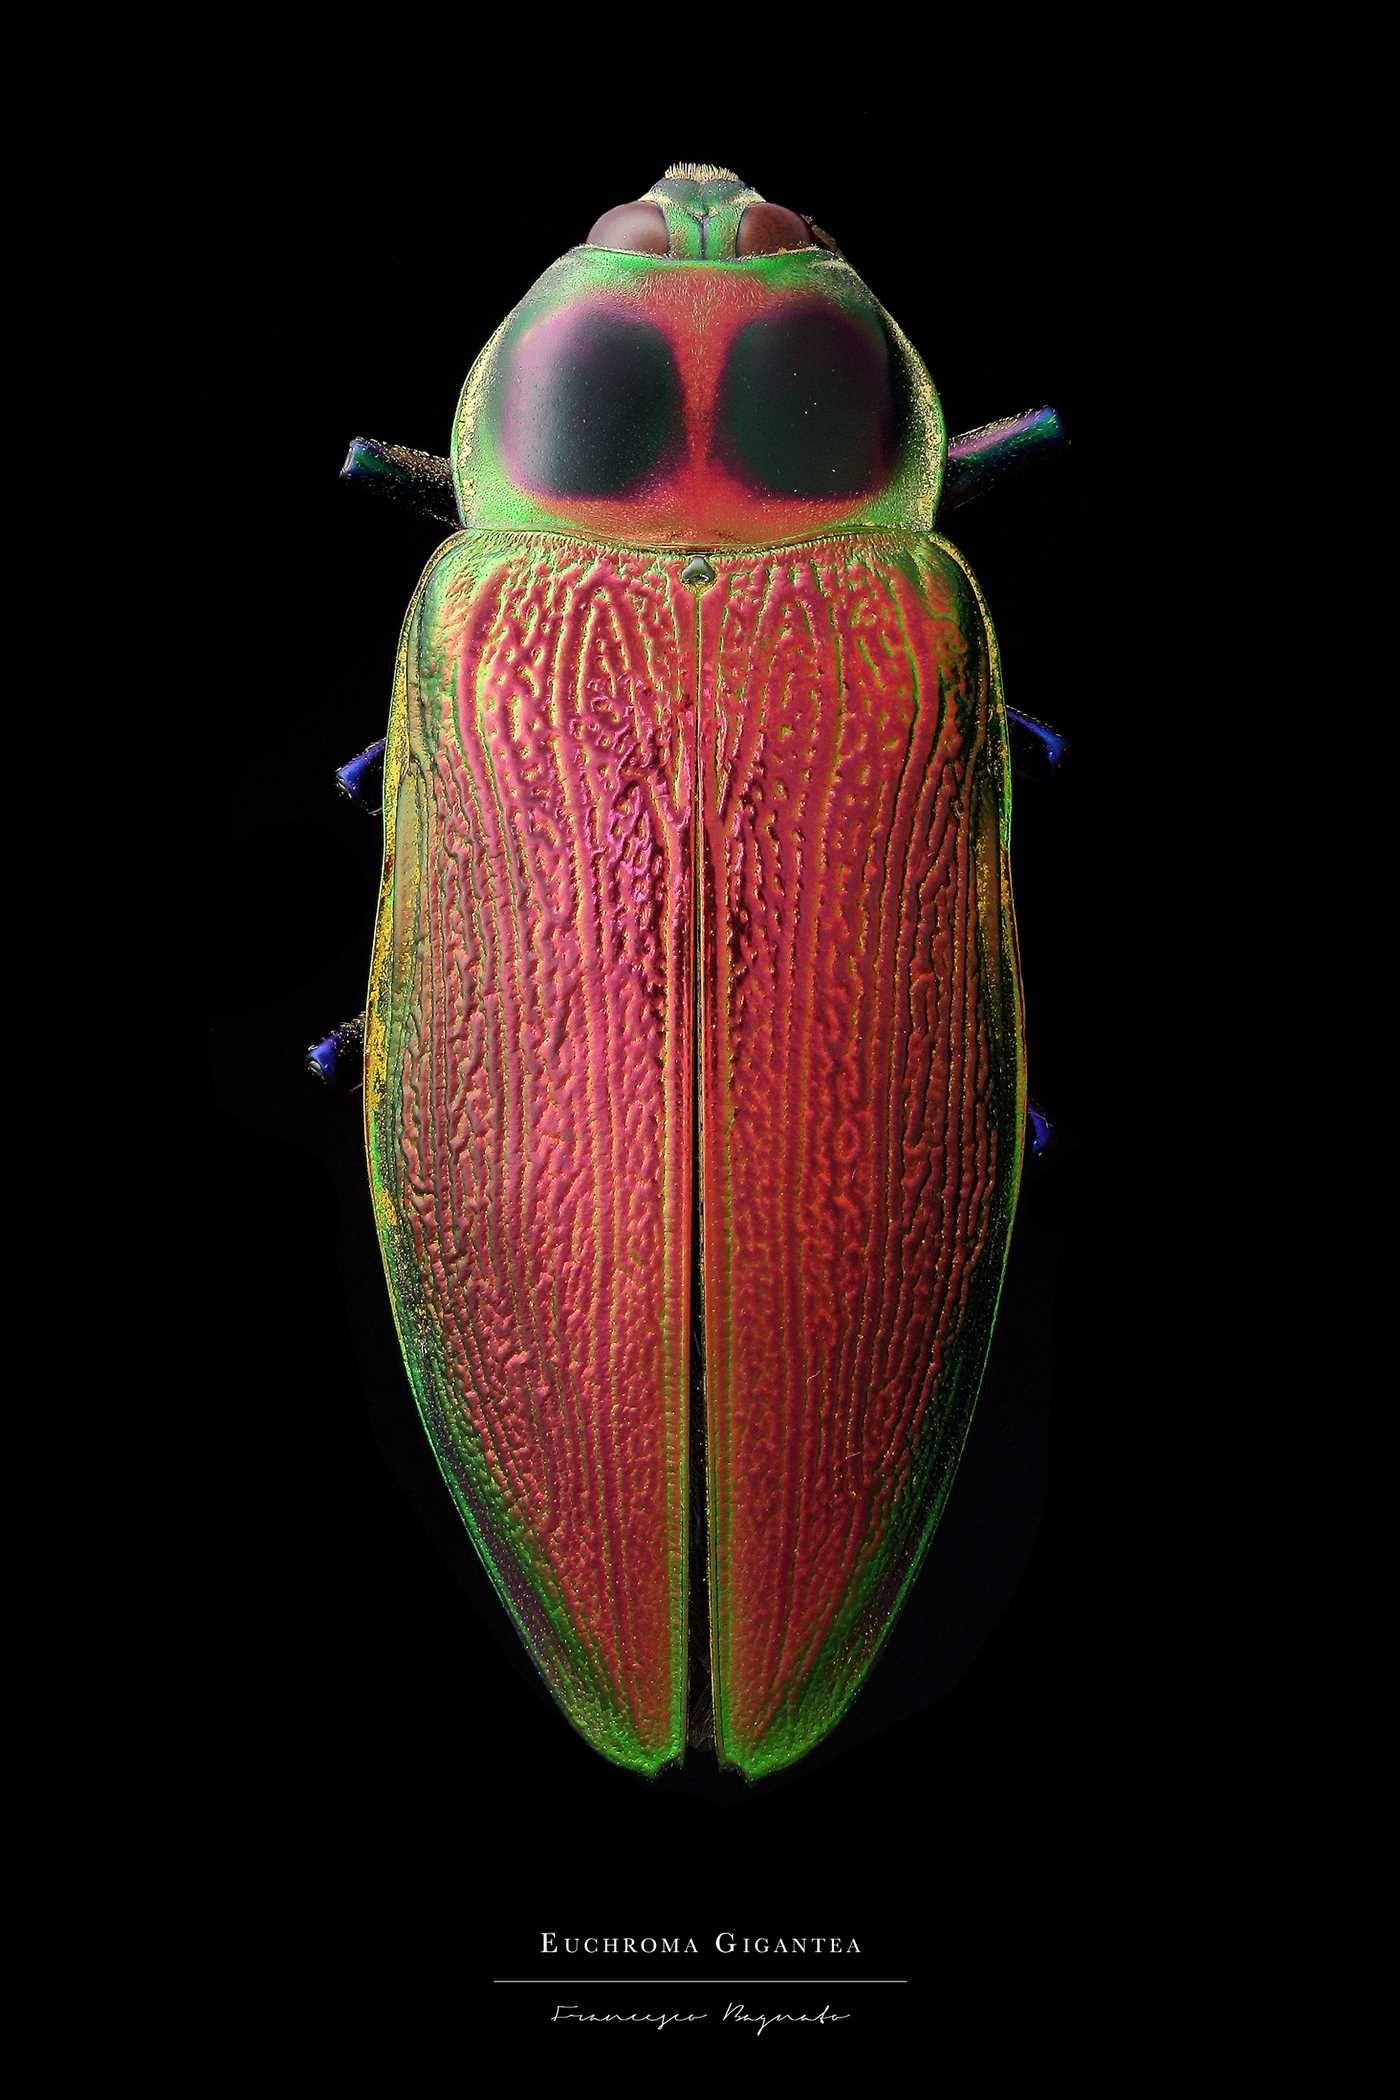 Entomology: Macro Portraits of Insects by Francesco Bagnato #inspiration #photography